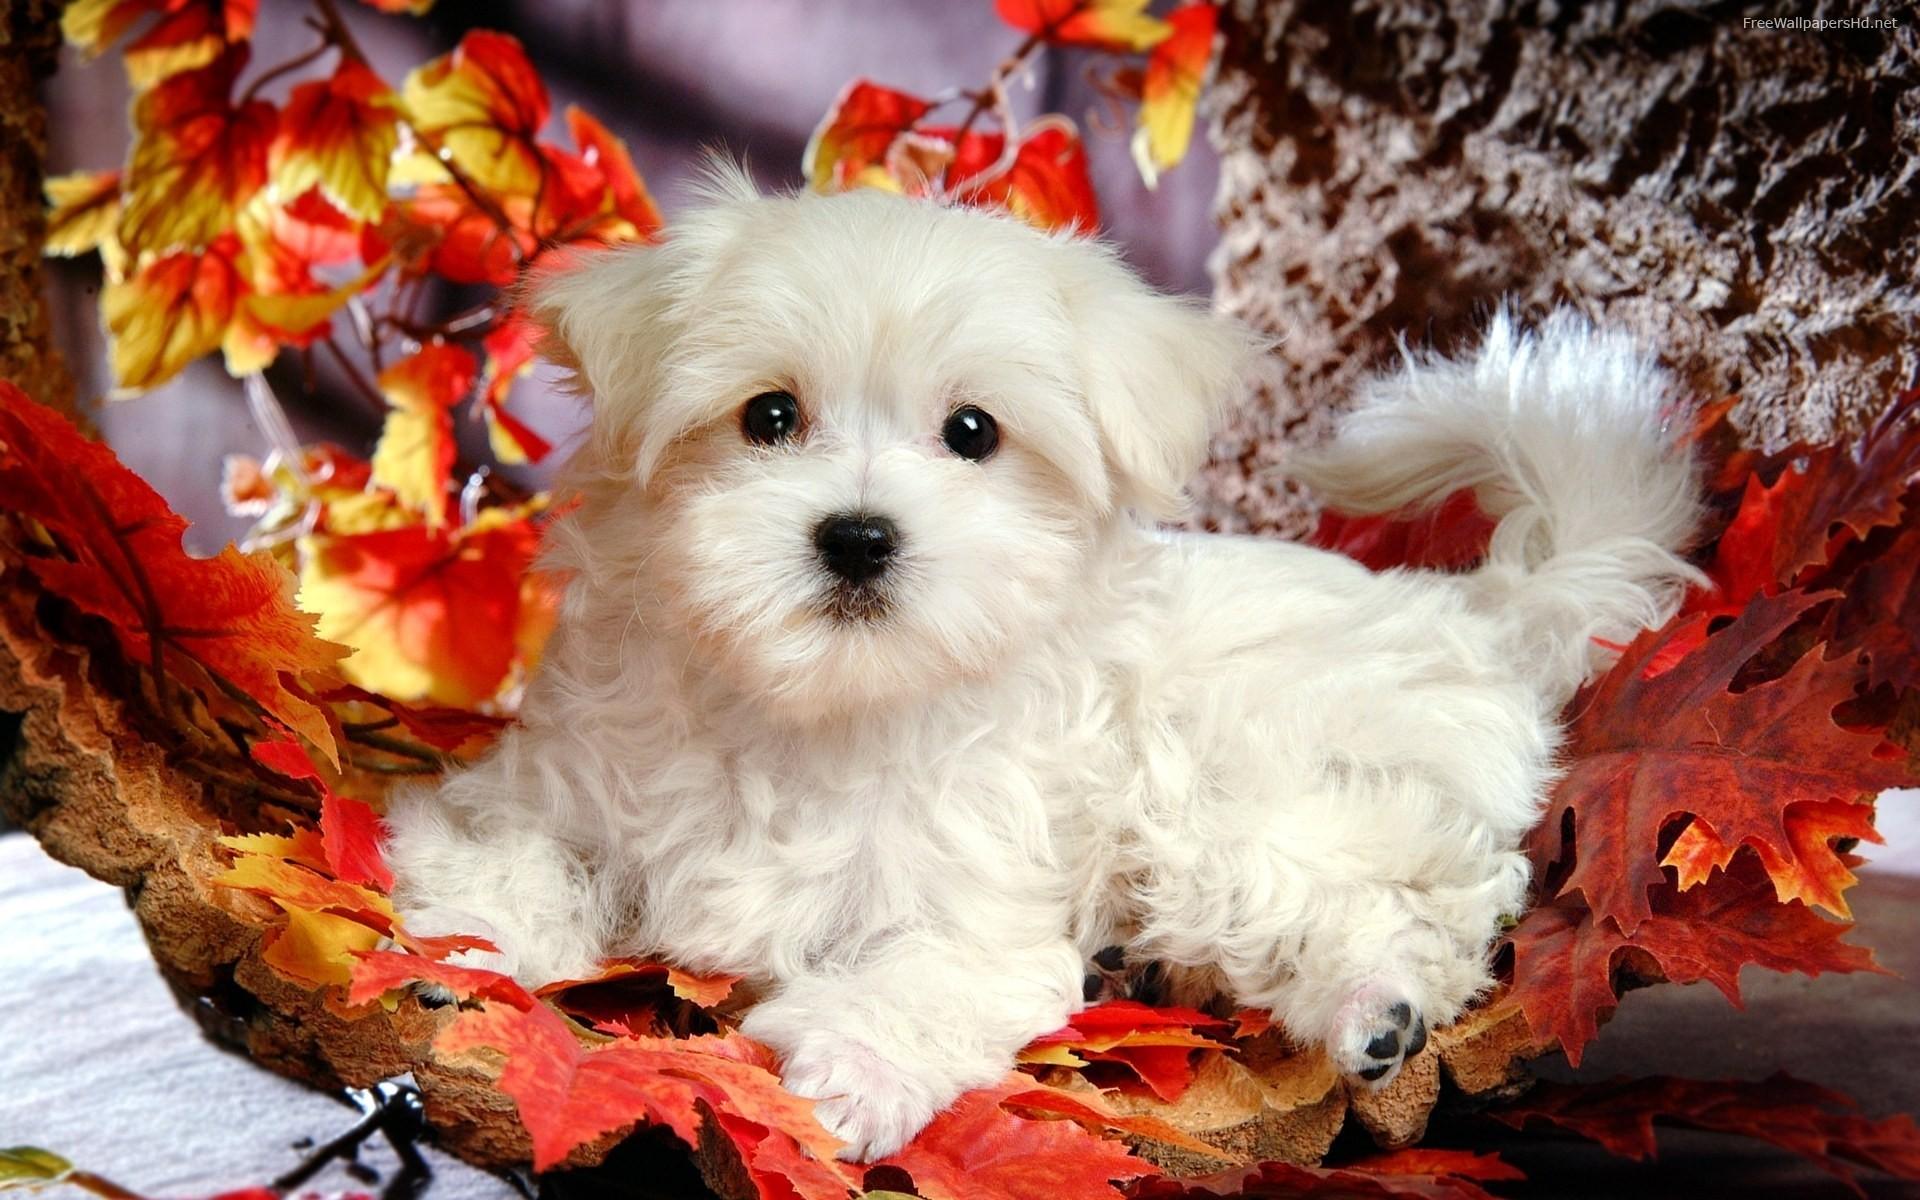 Cute Puppy Wallpaper: Cute White Puppy Hd Wallpaper 1920x1200px